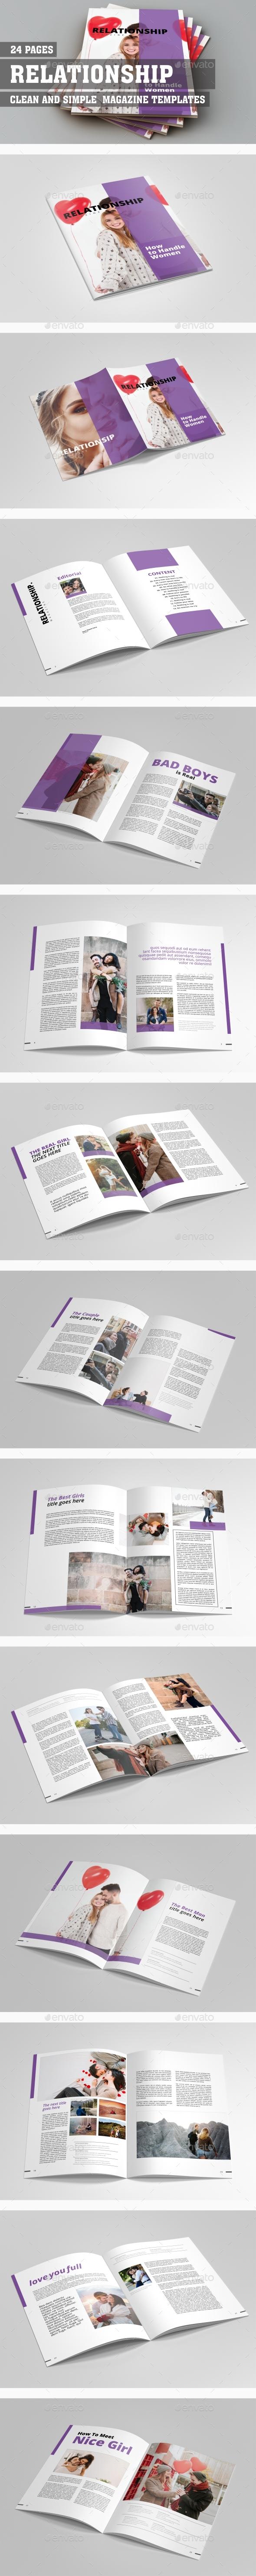 Relationship Magazine - Magazines Print Templates